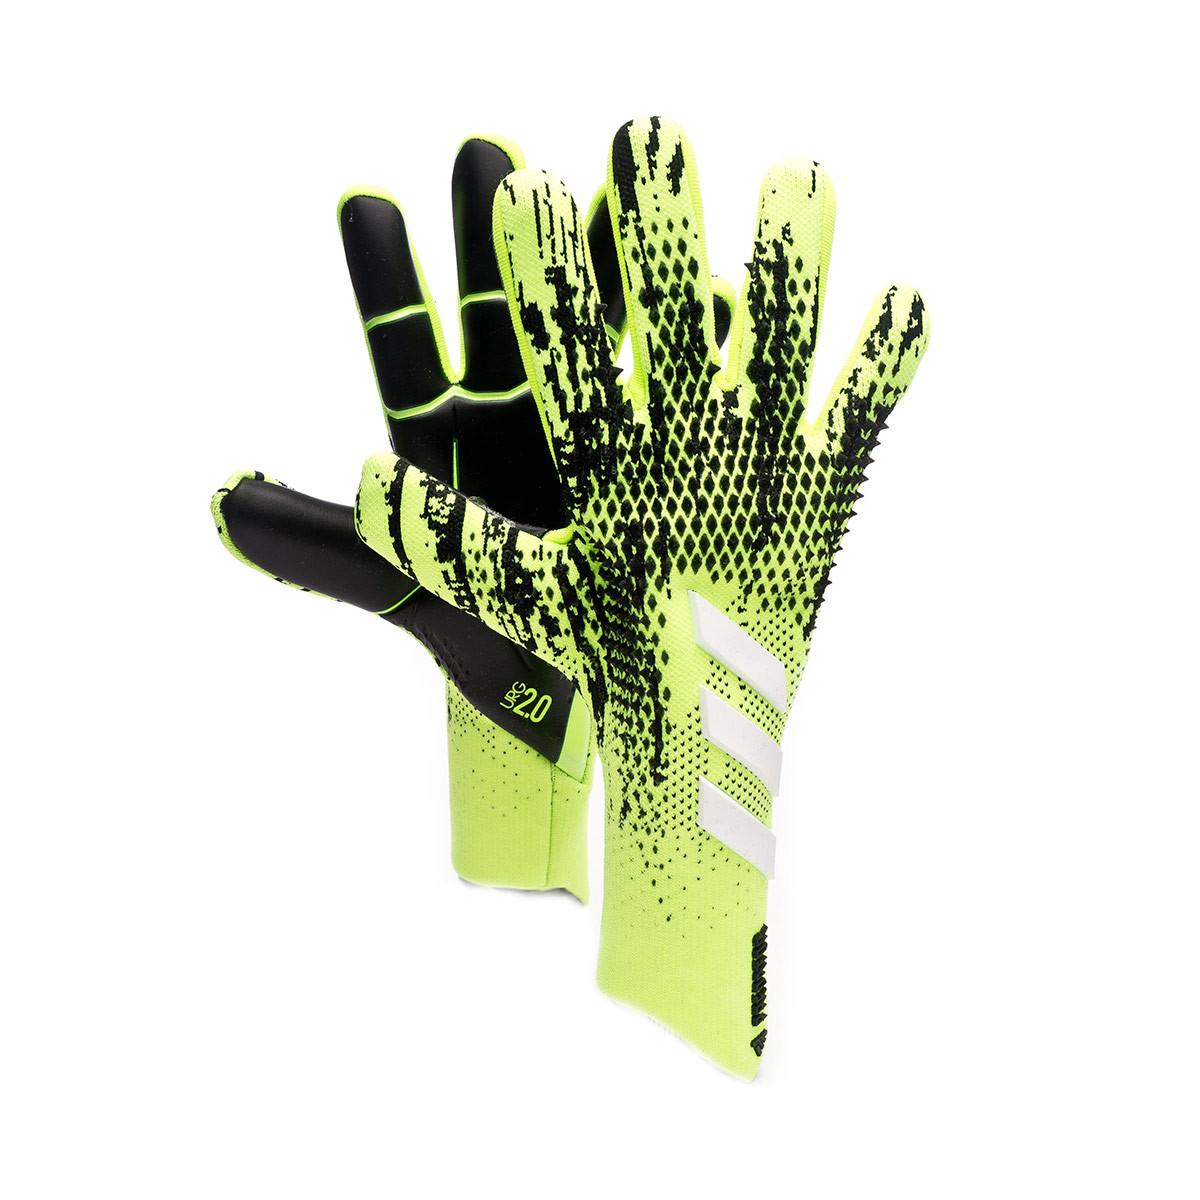 Anterior famélico escritura  Glove adidas Predator Pro Signal green-Black-Energy ink-White - Football  store Fútbol Emotion